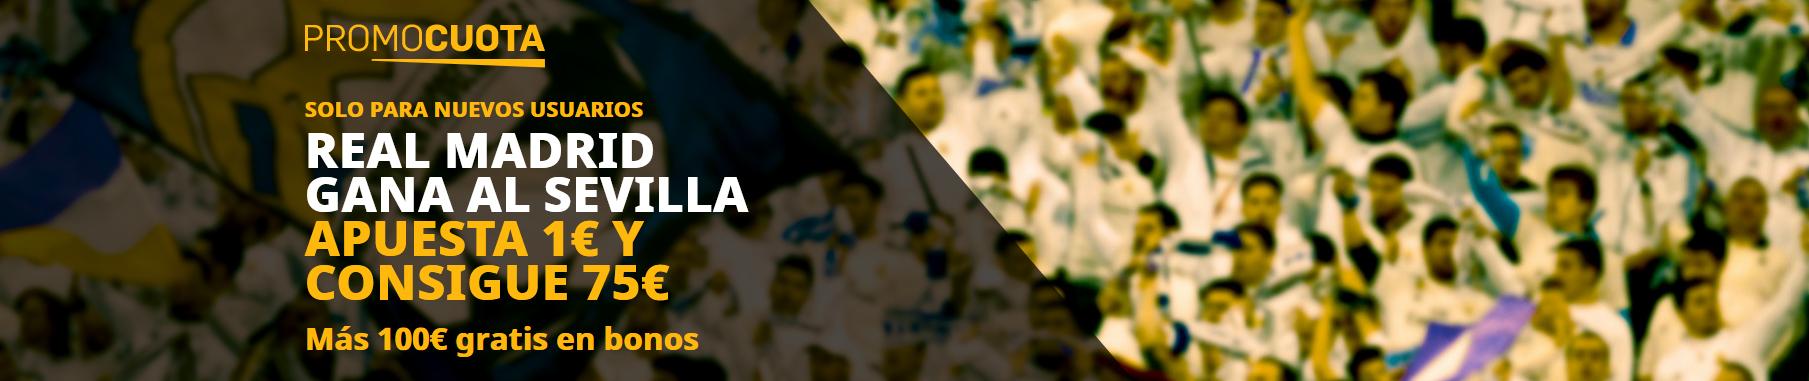 Promocuota Real Madrid vence Sevilla